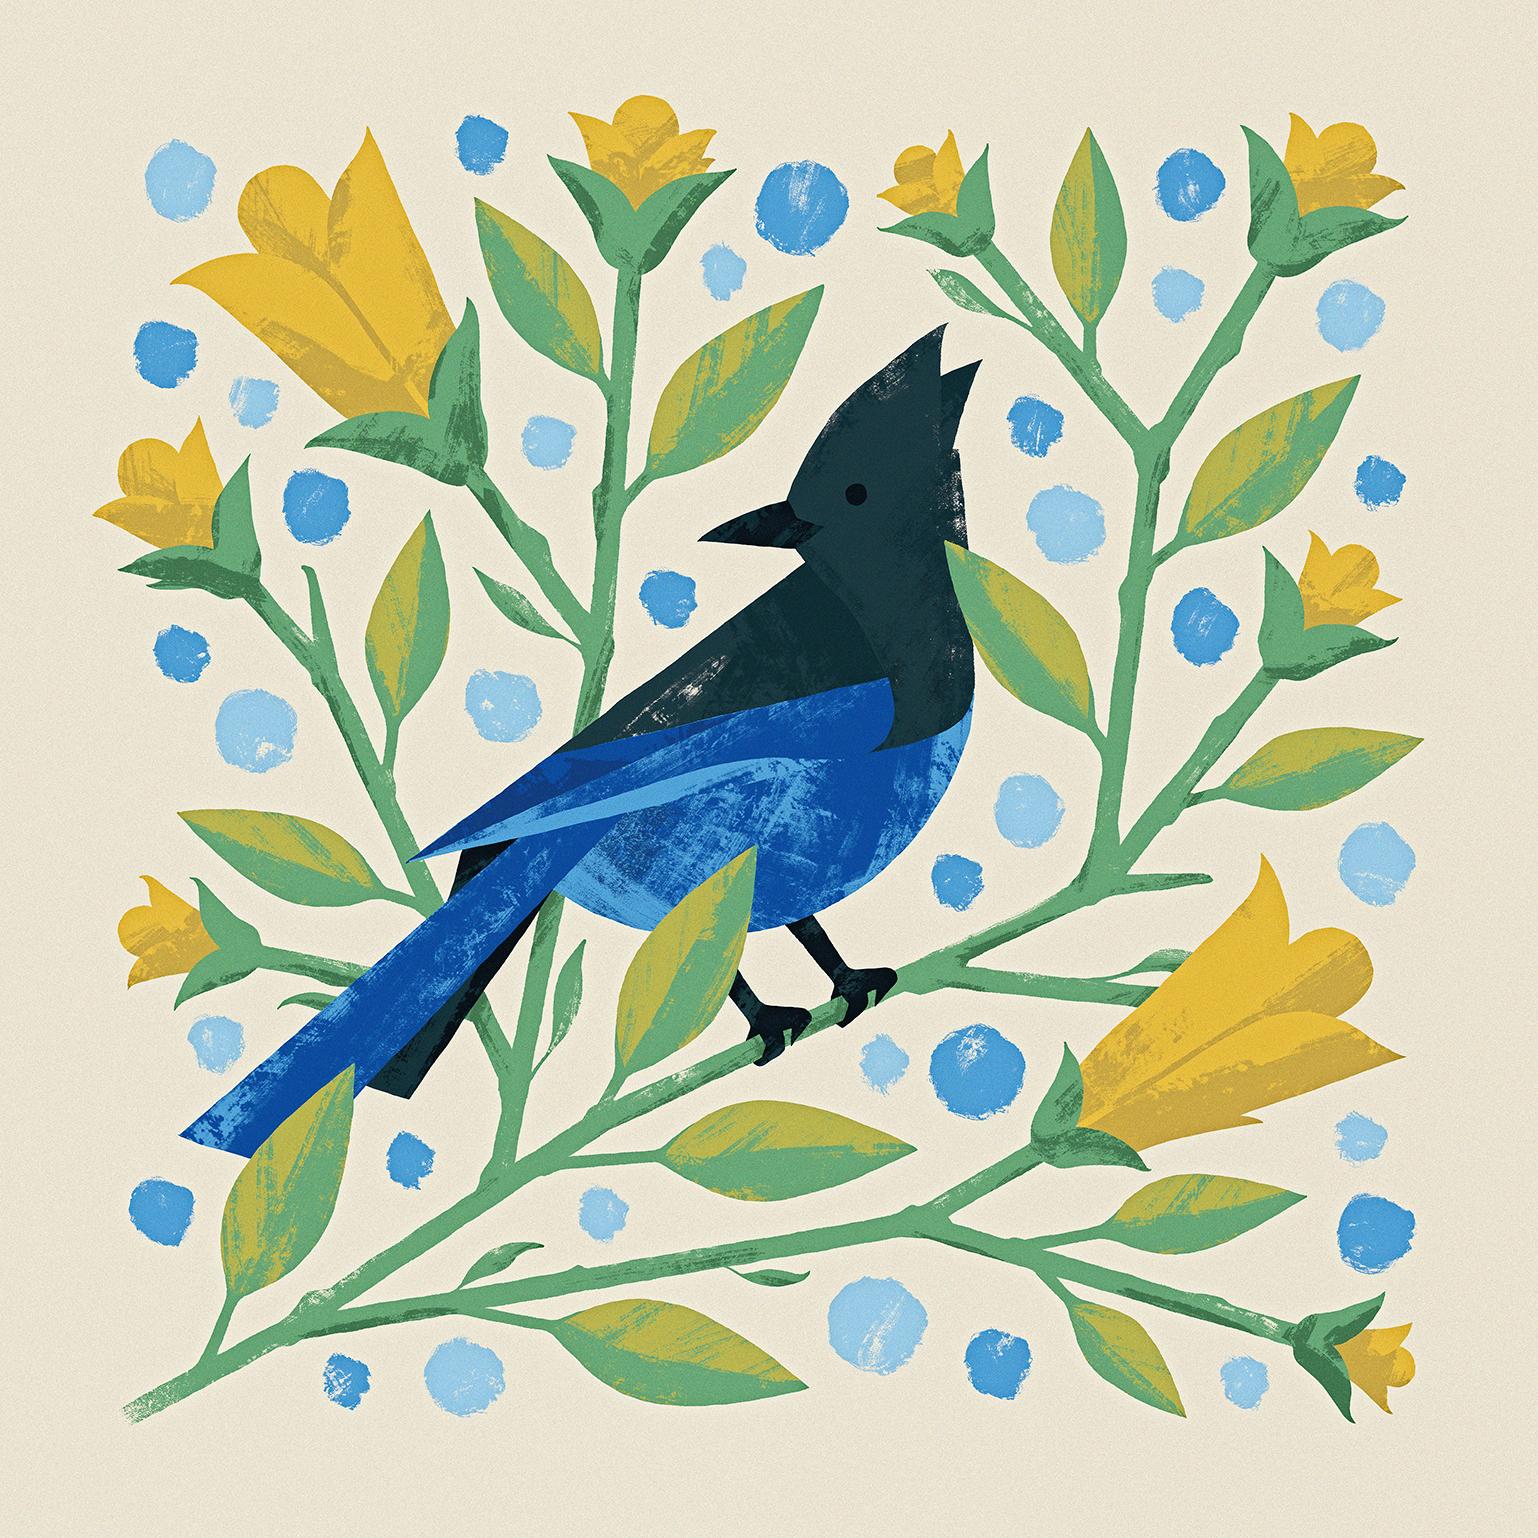 Steller's Jay Illustration